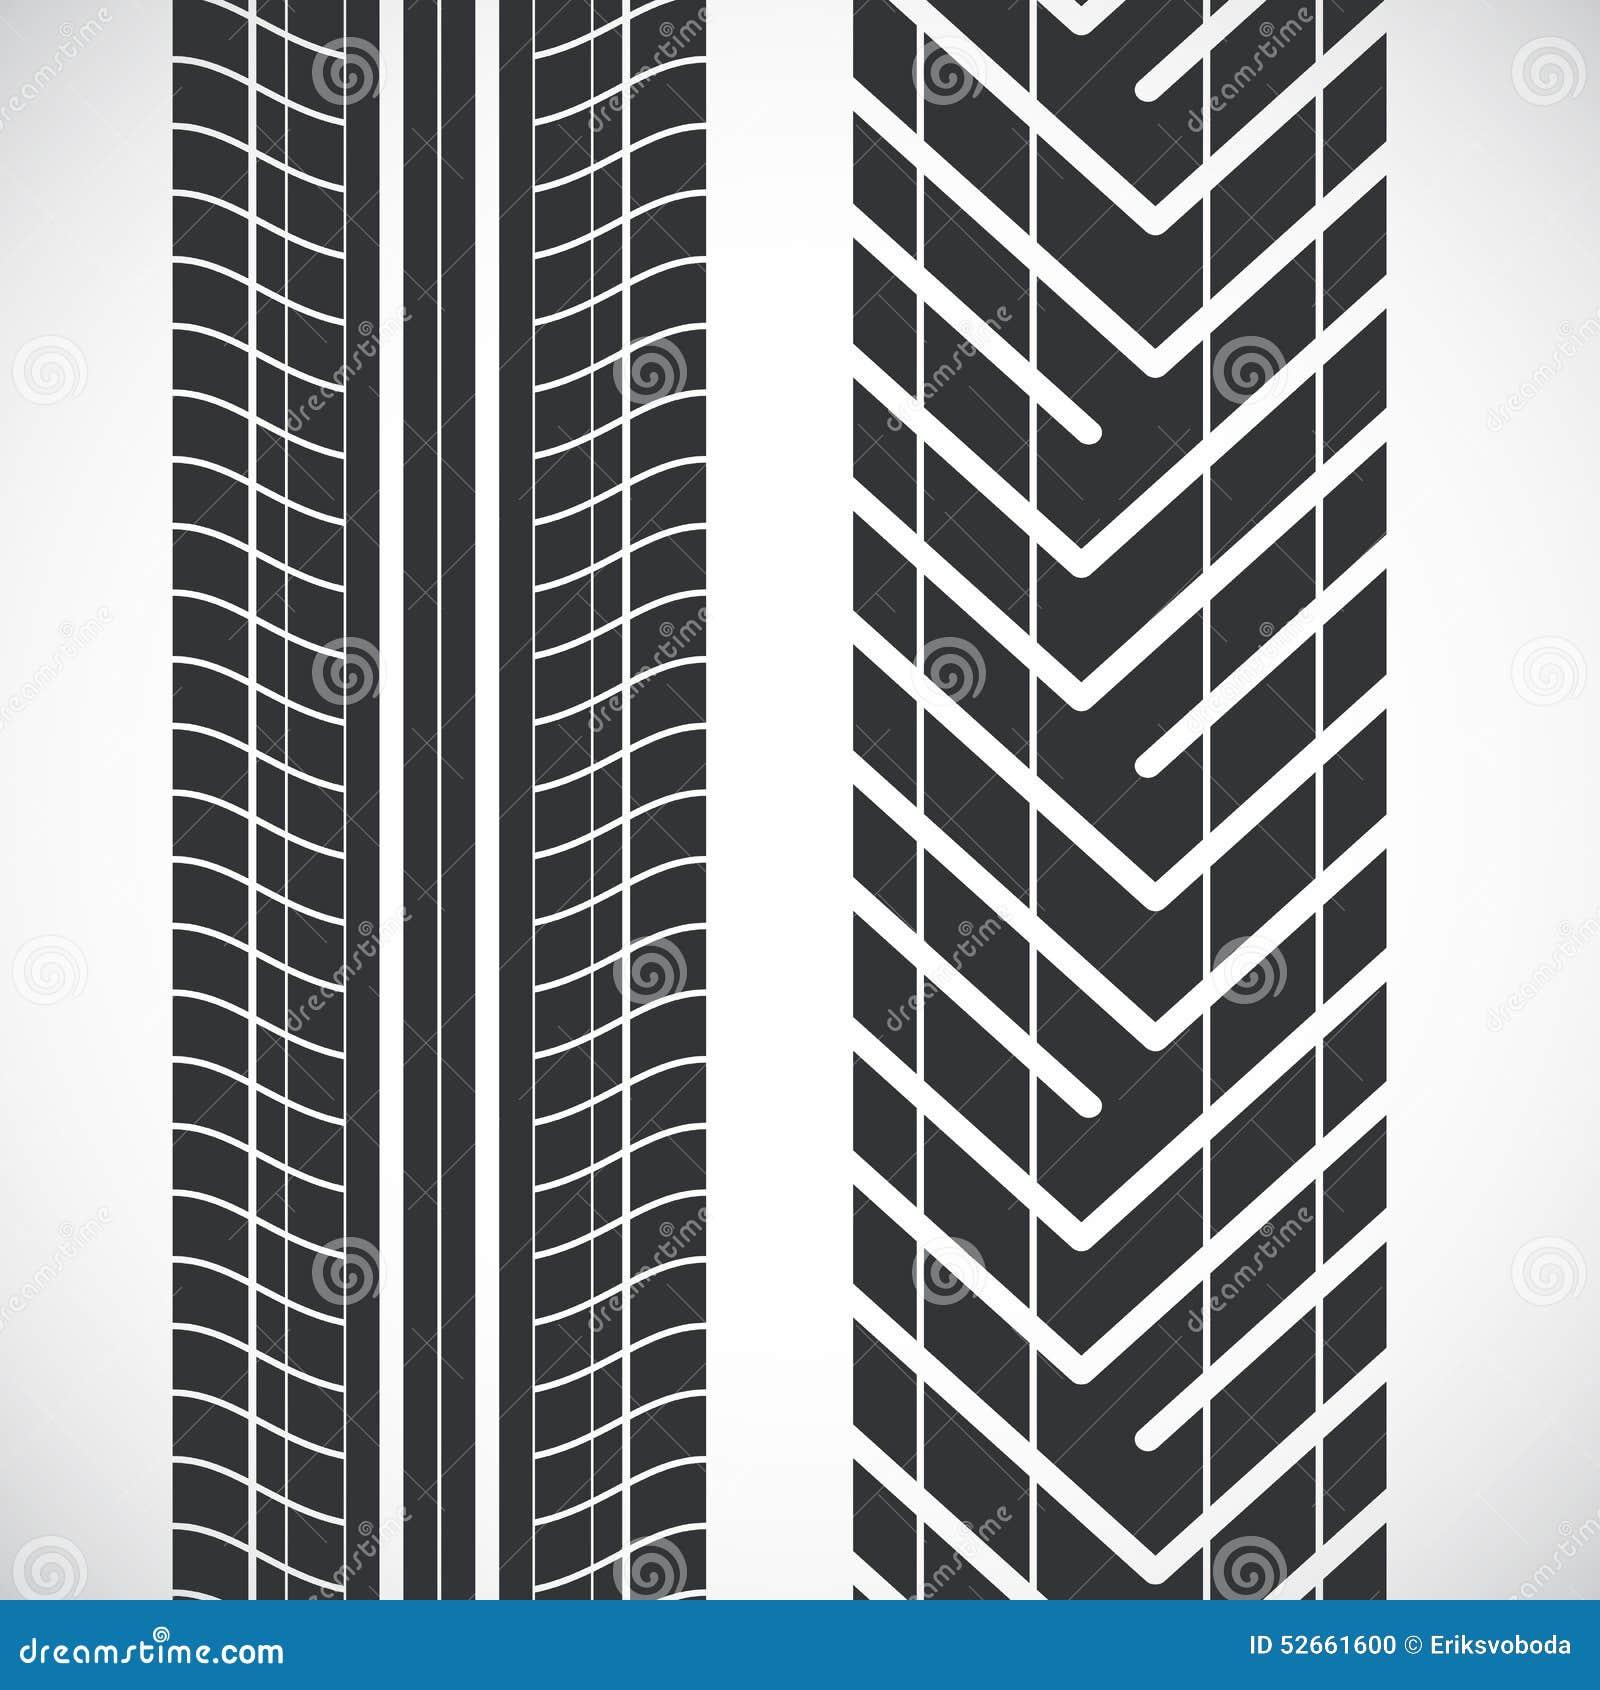 Tread pattern tyre stock vector. Image of design, symbol - 52661600